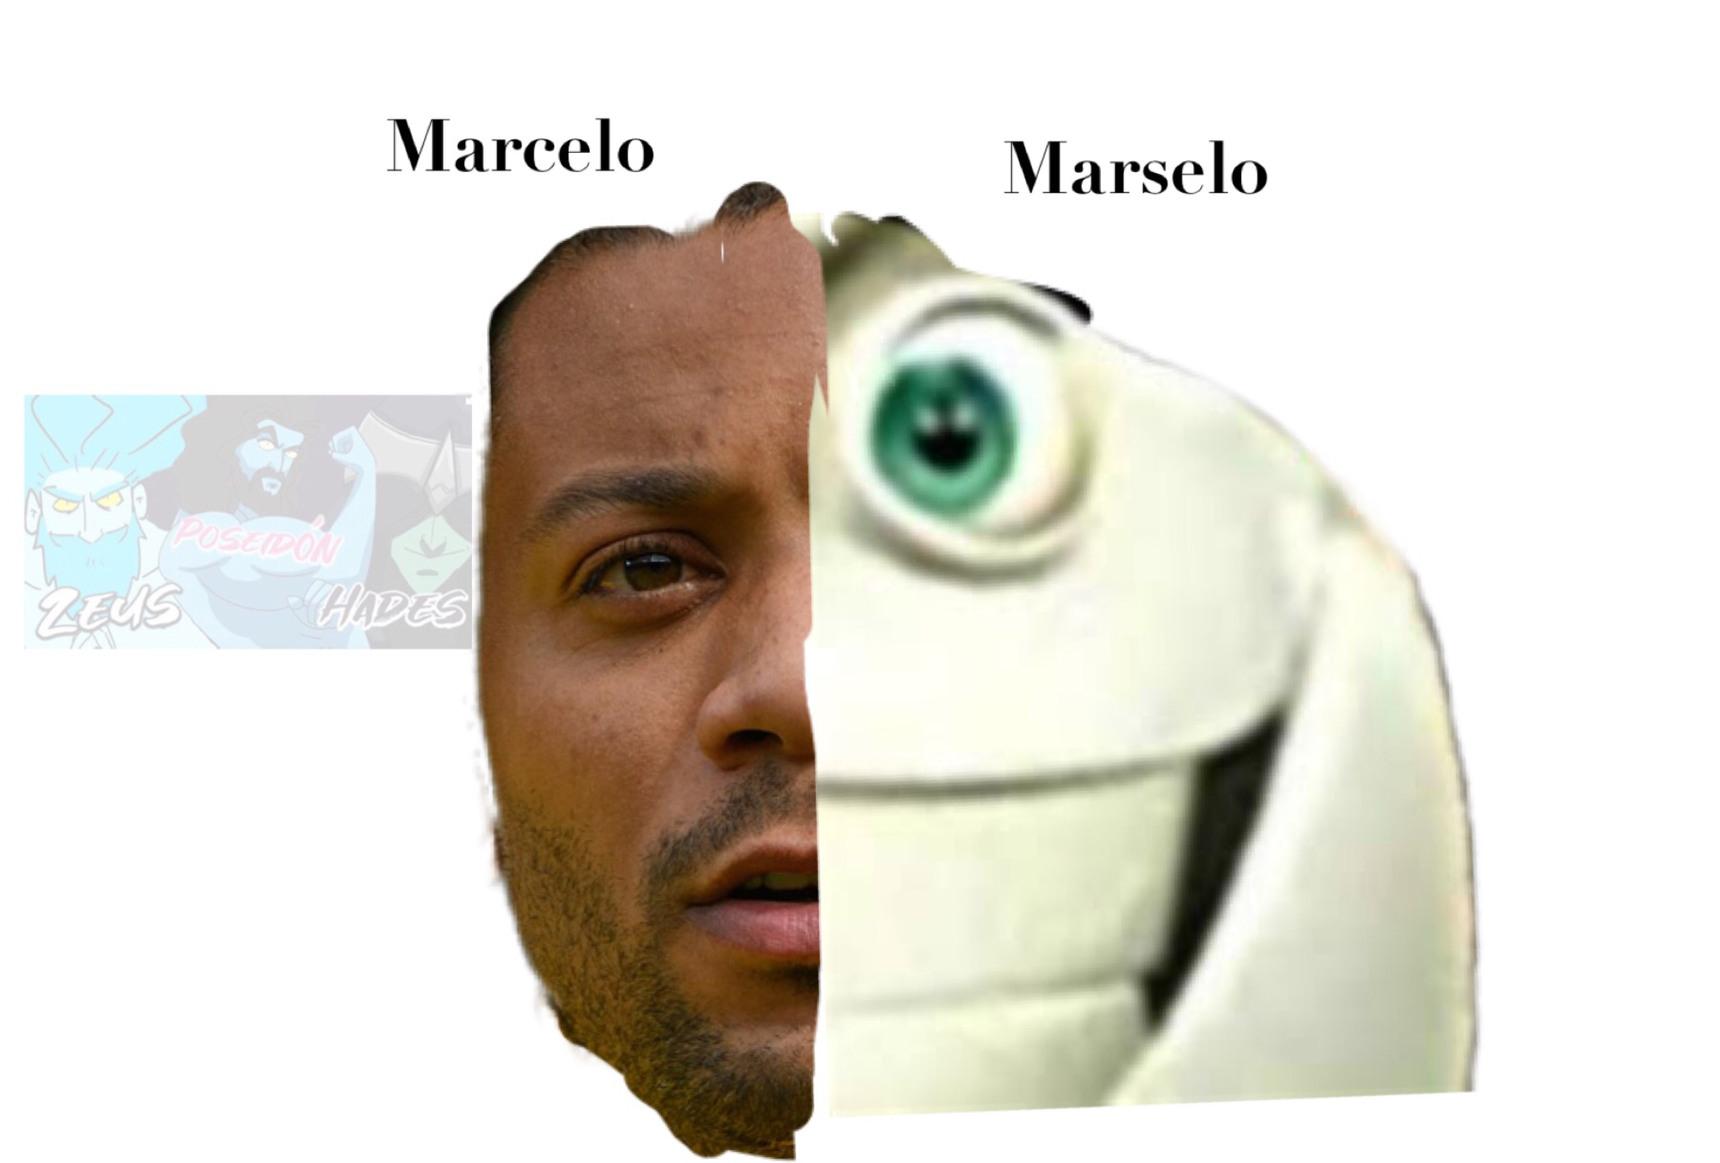 Las dos caras de la moneda - meme